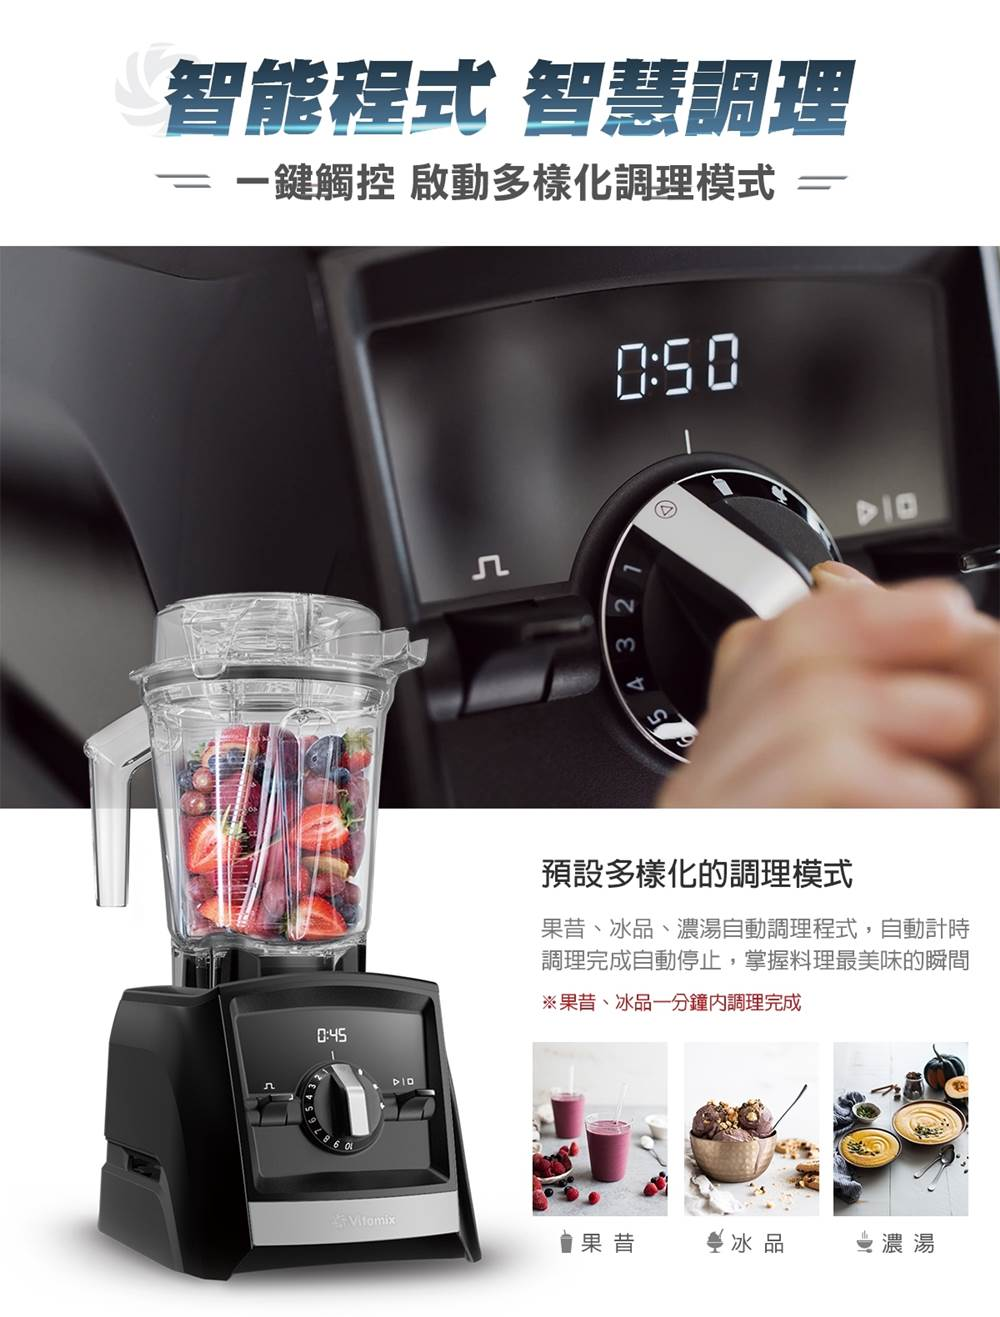 Vitamix-A2500i超跑級調理機-Ascent-智能程式_智慧調理_3預設模式